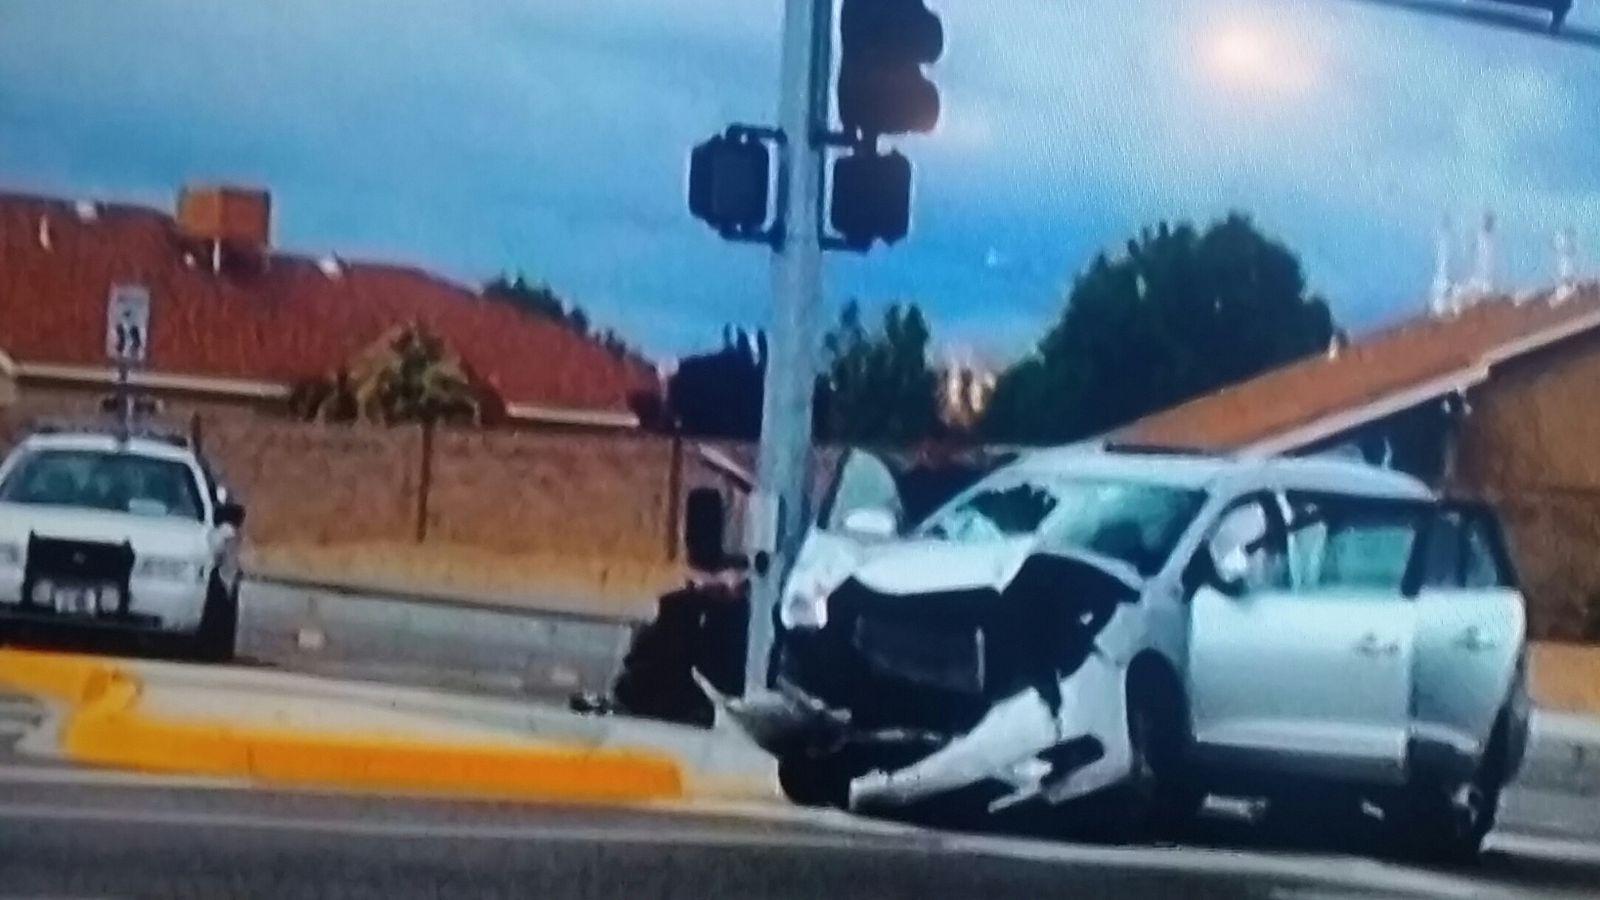 WHOA! Here's The Pic Of Jon Jones Smashed-up Rental Car